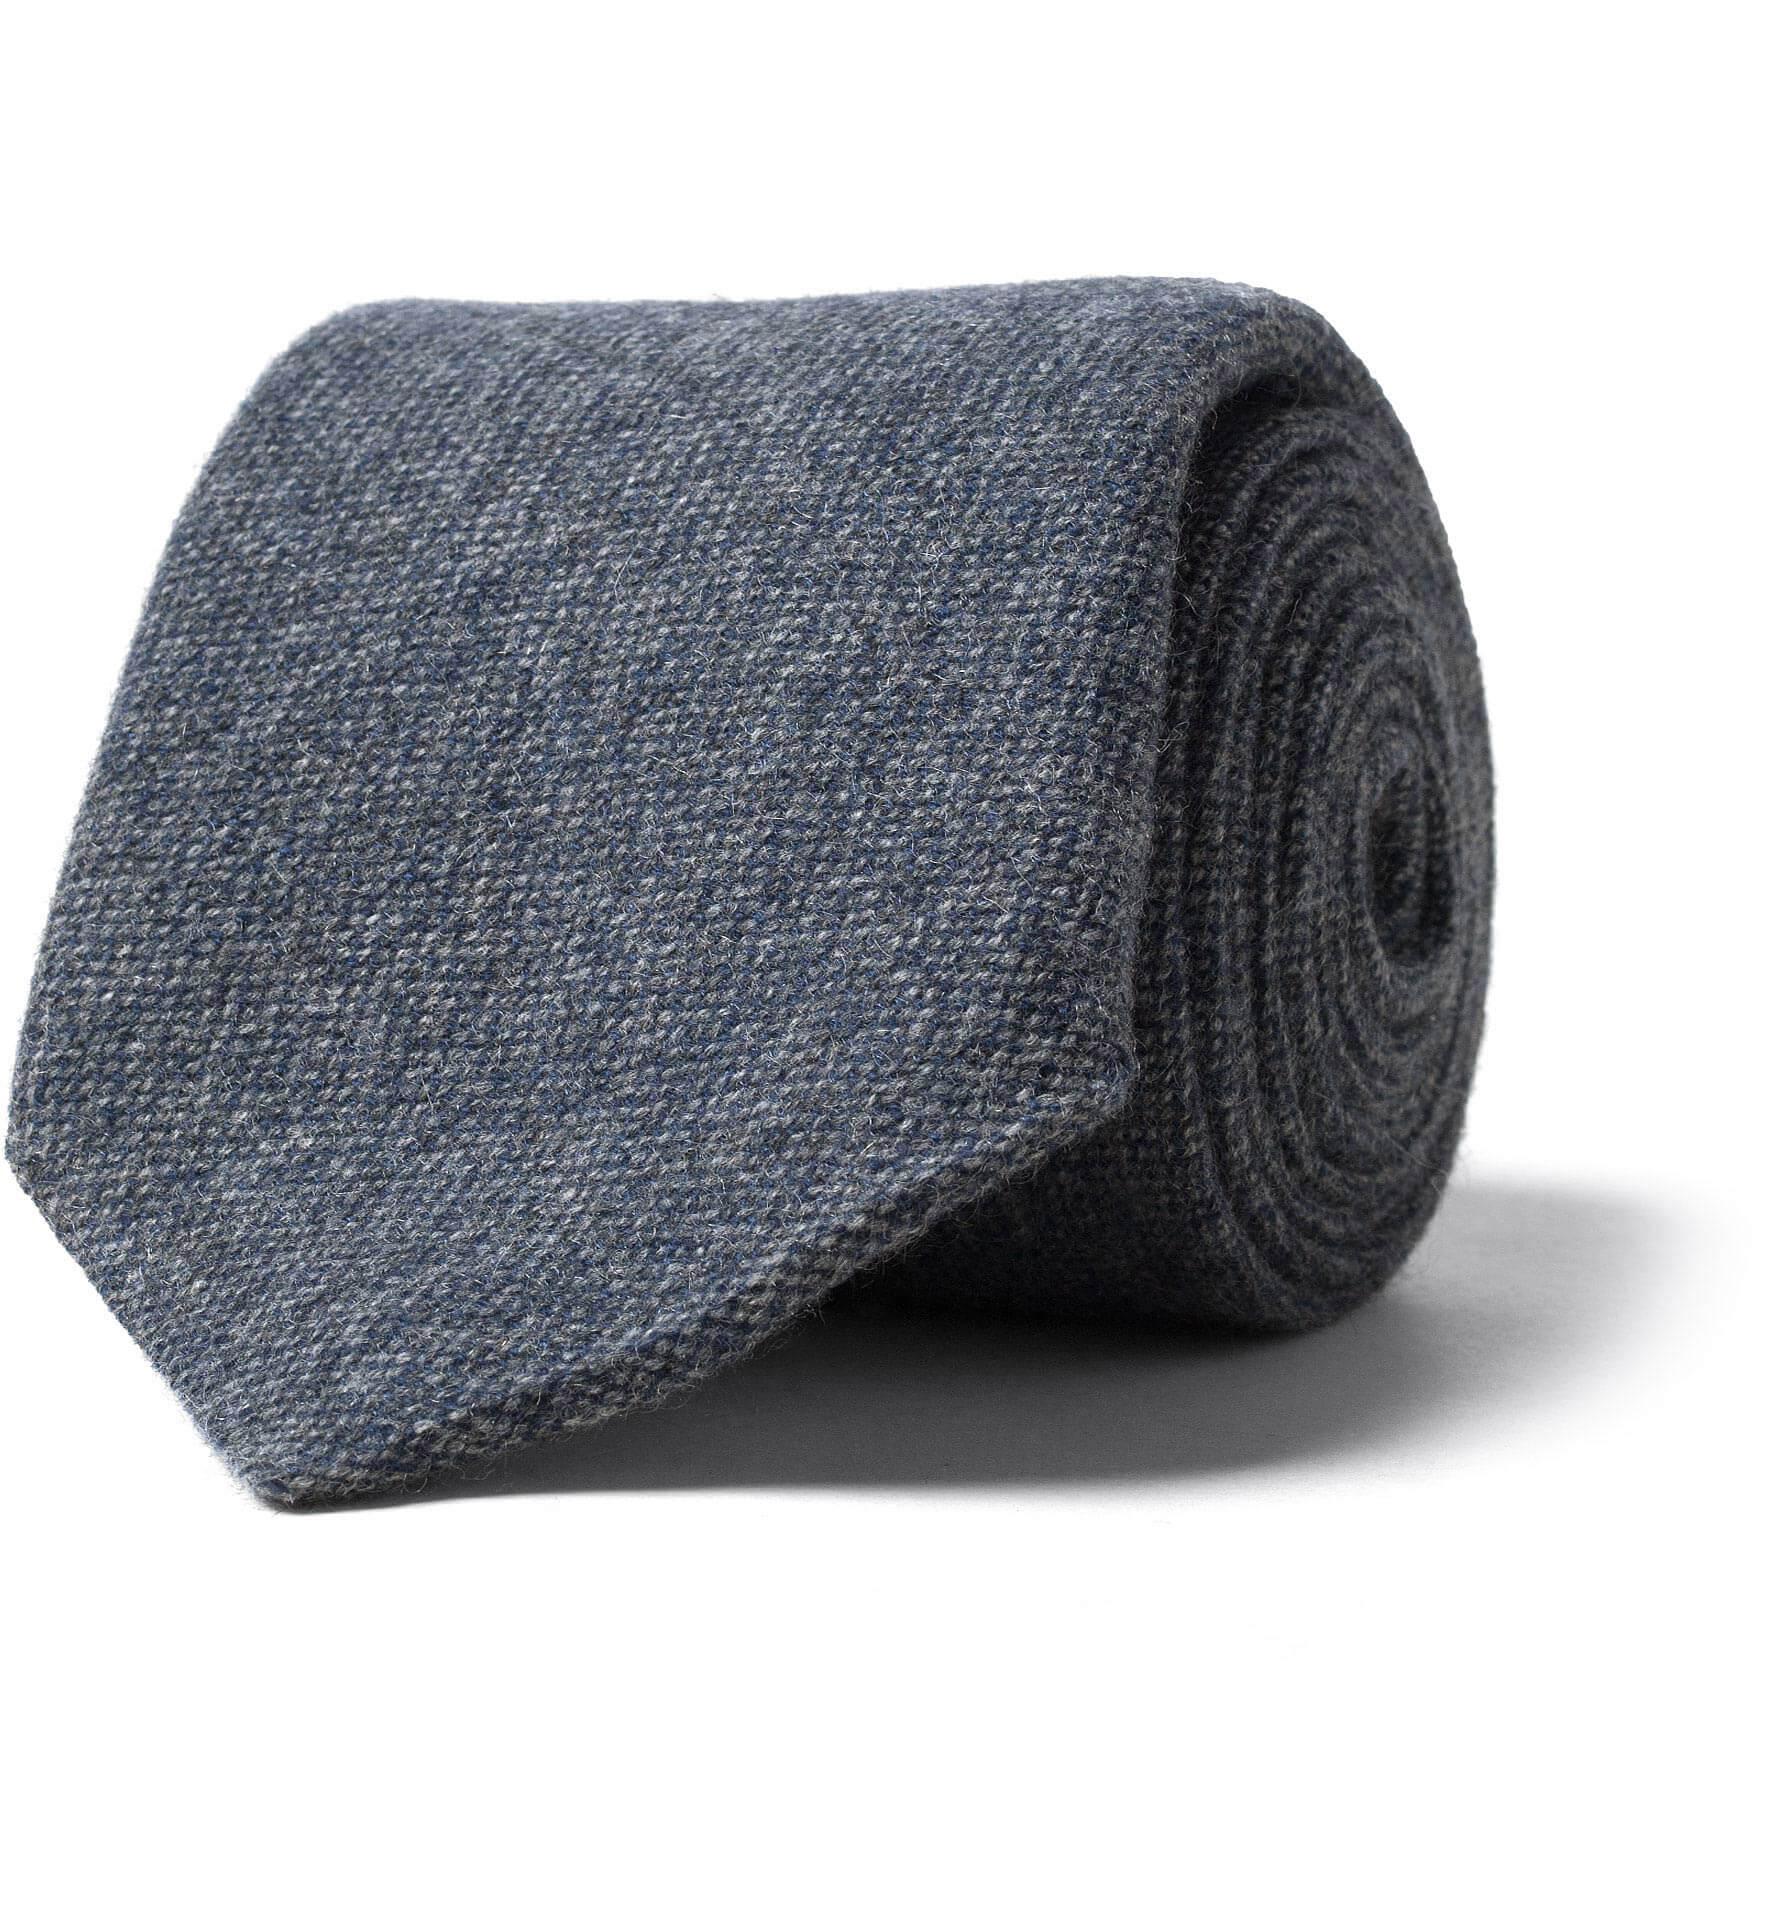 Zoom Image of Slate Cashmere Tie